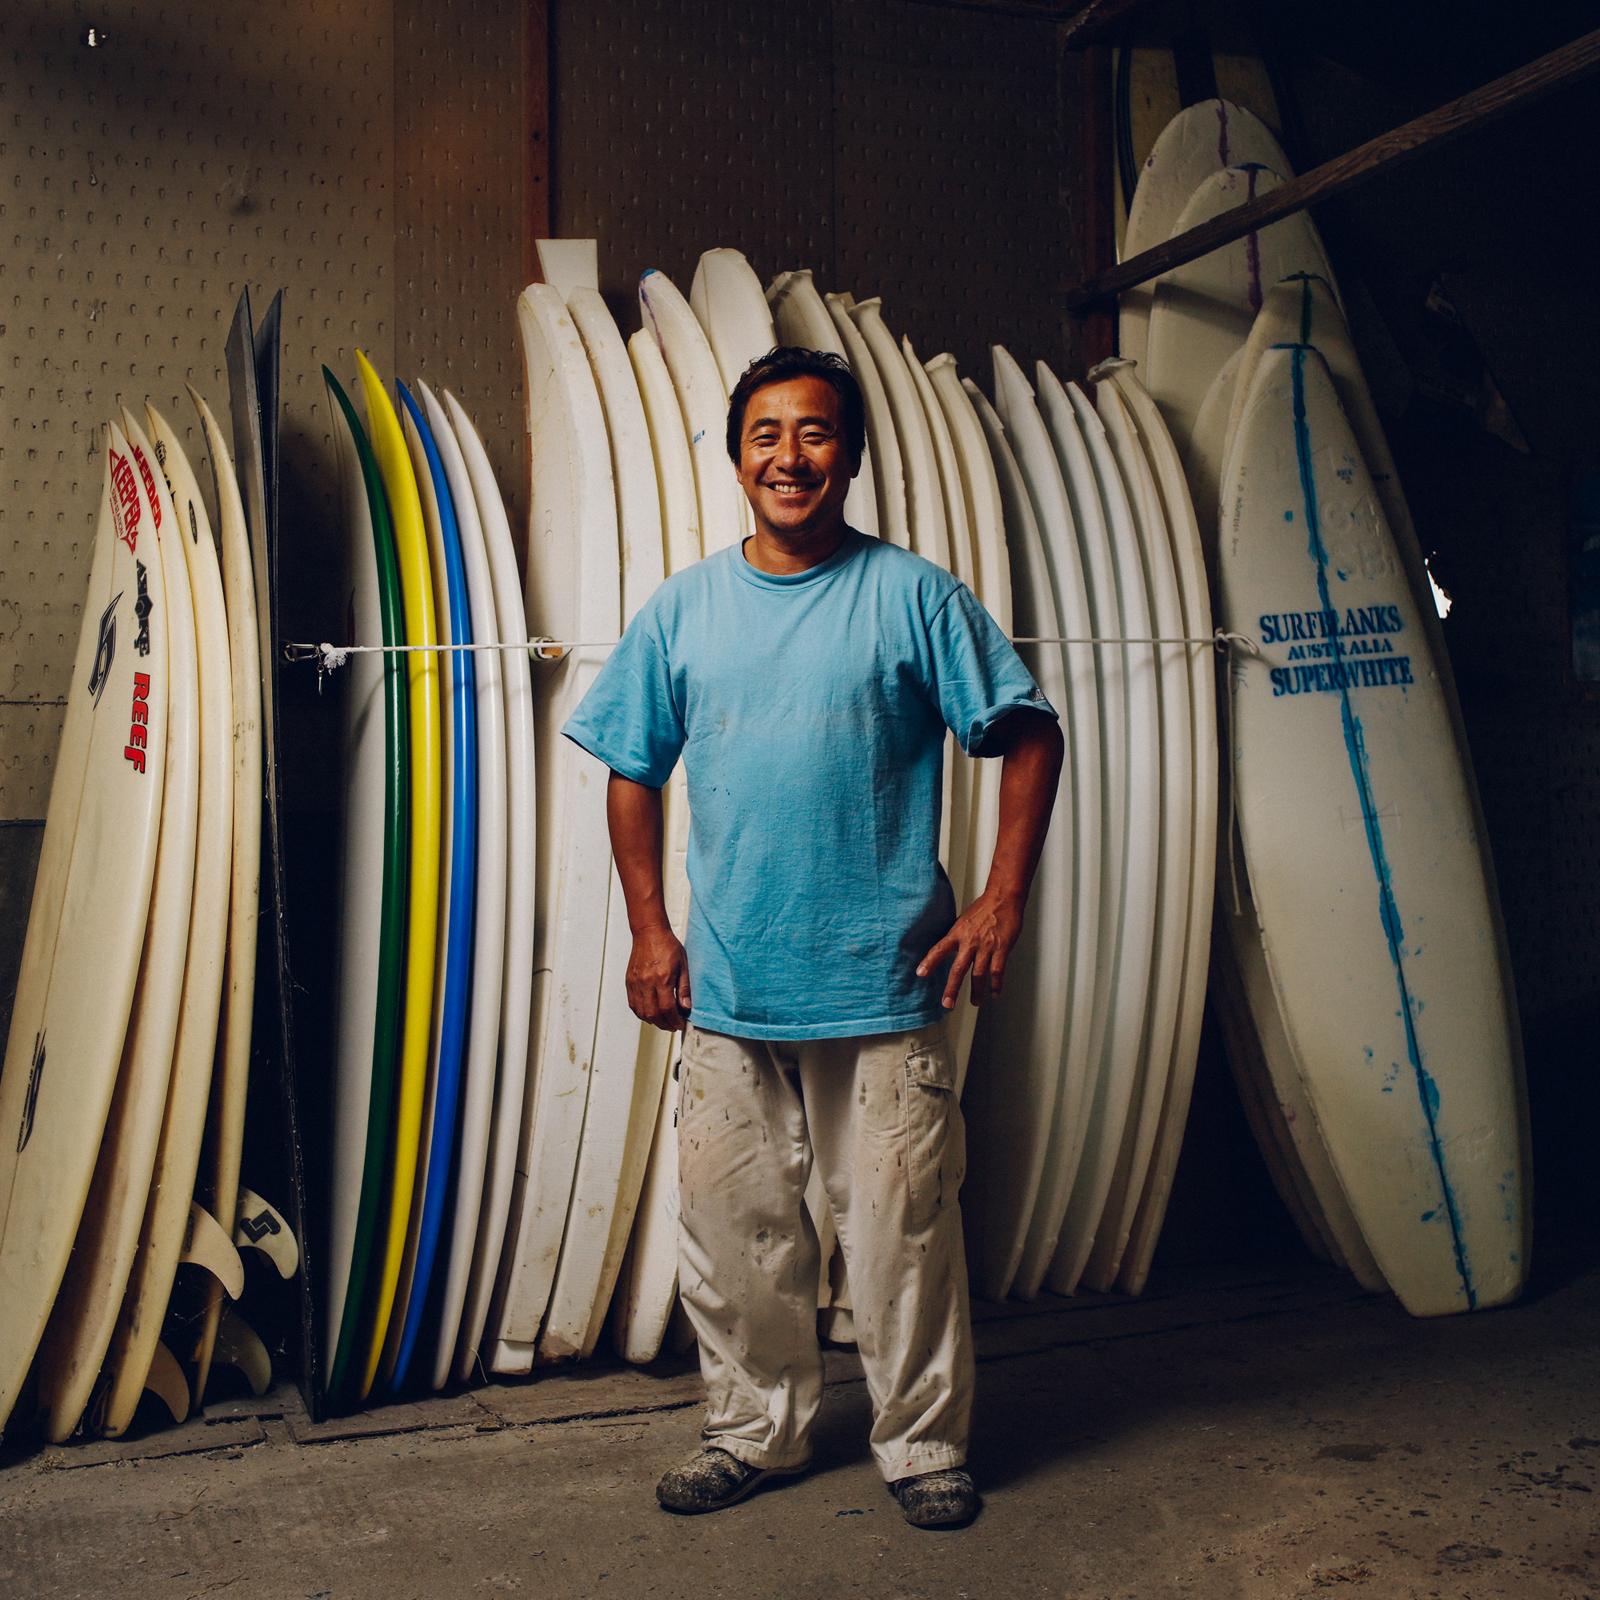 Surfboard builder